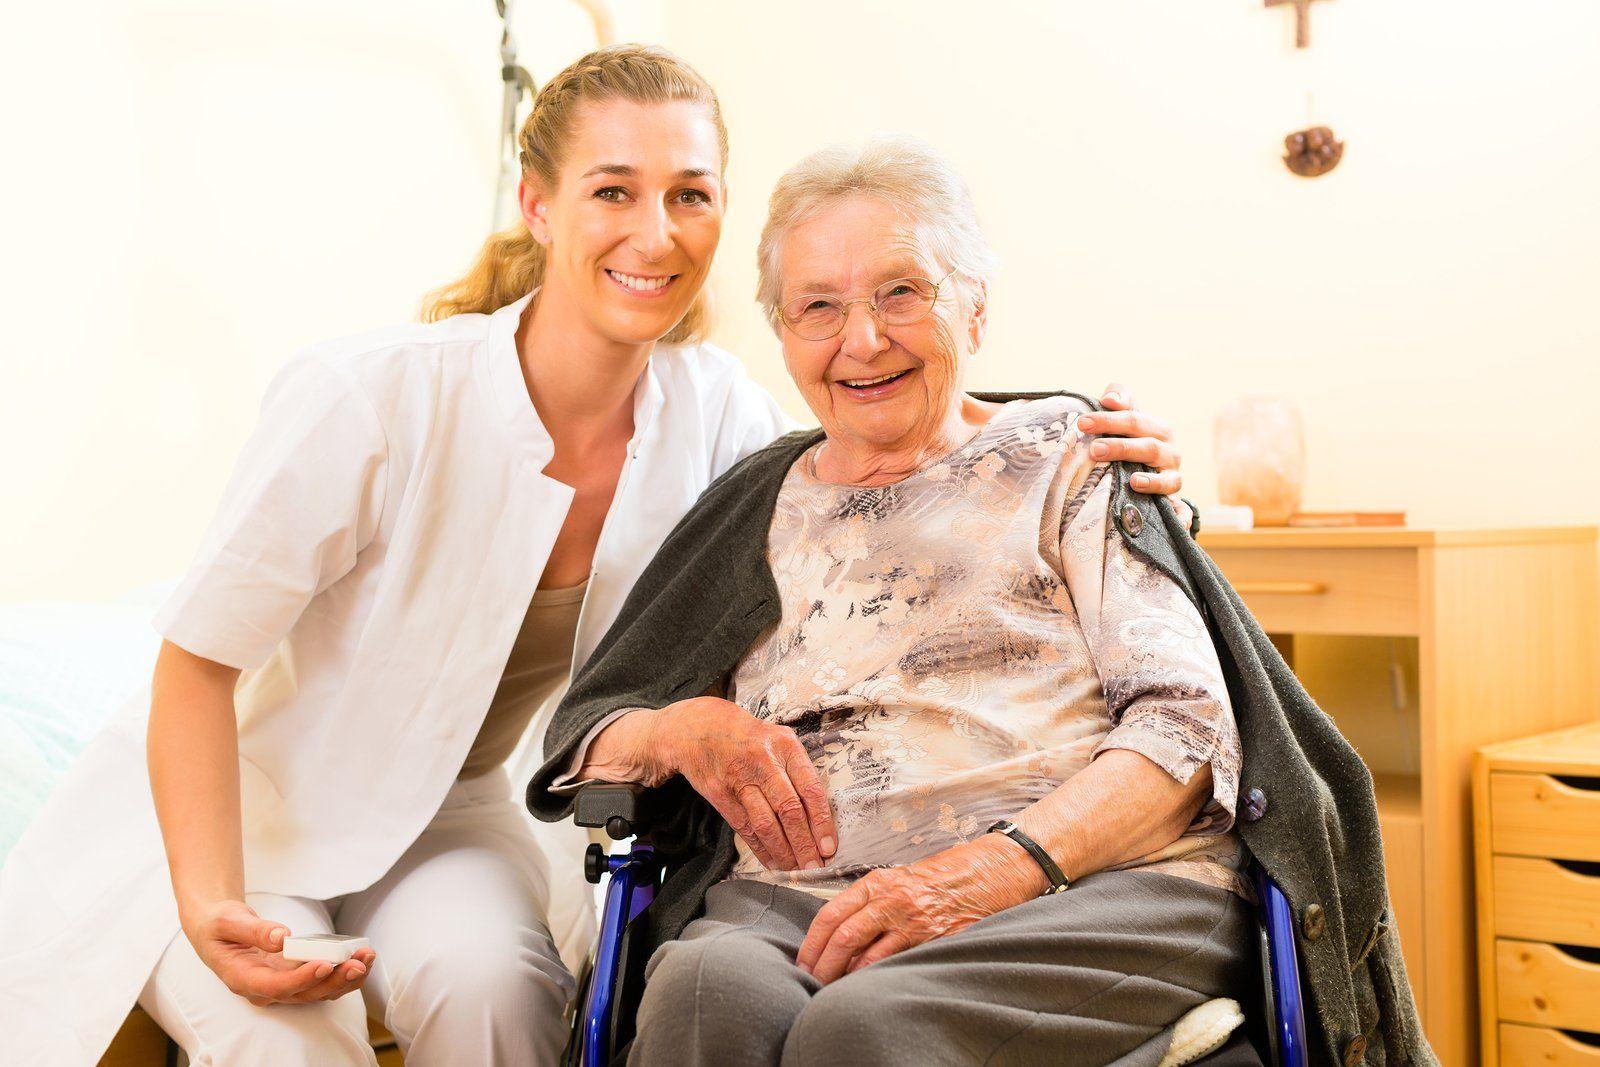 CNAs provide basic patient care services under the